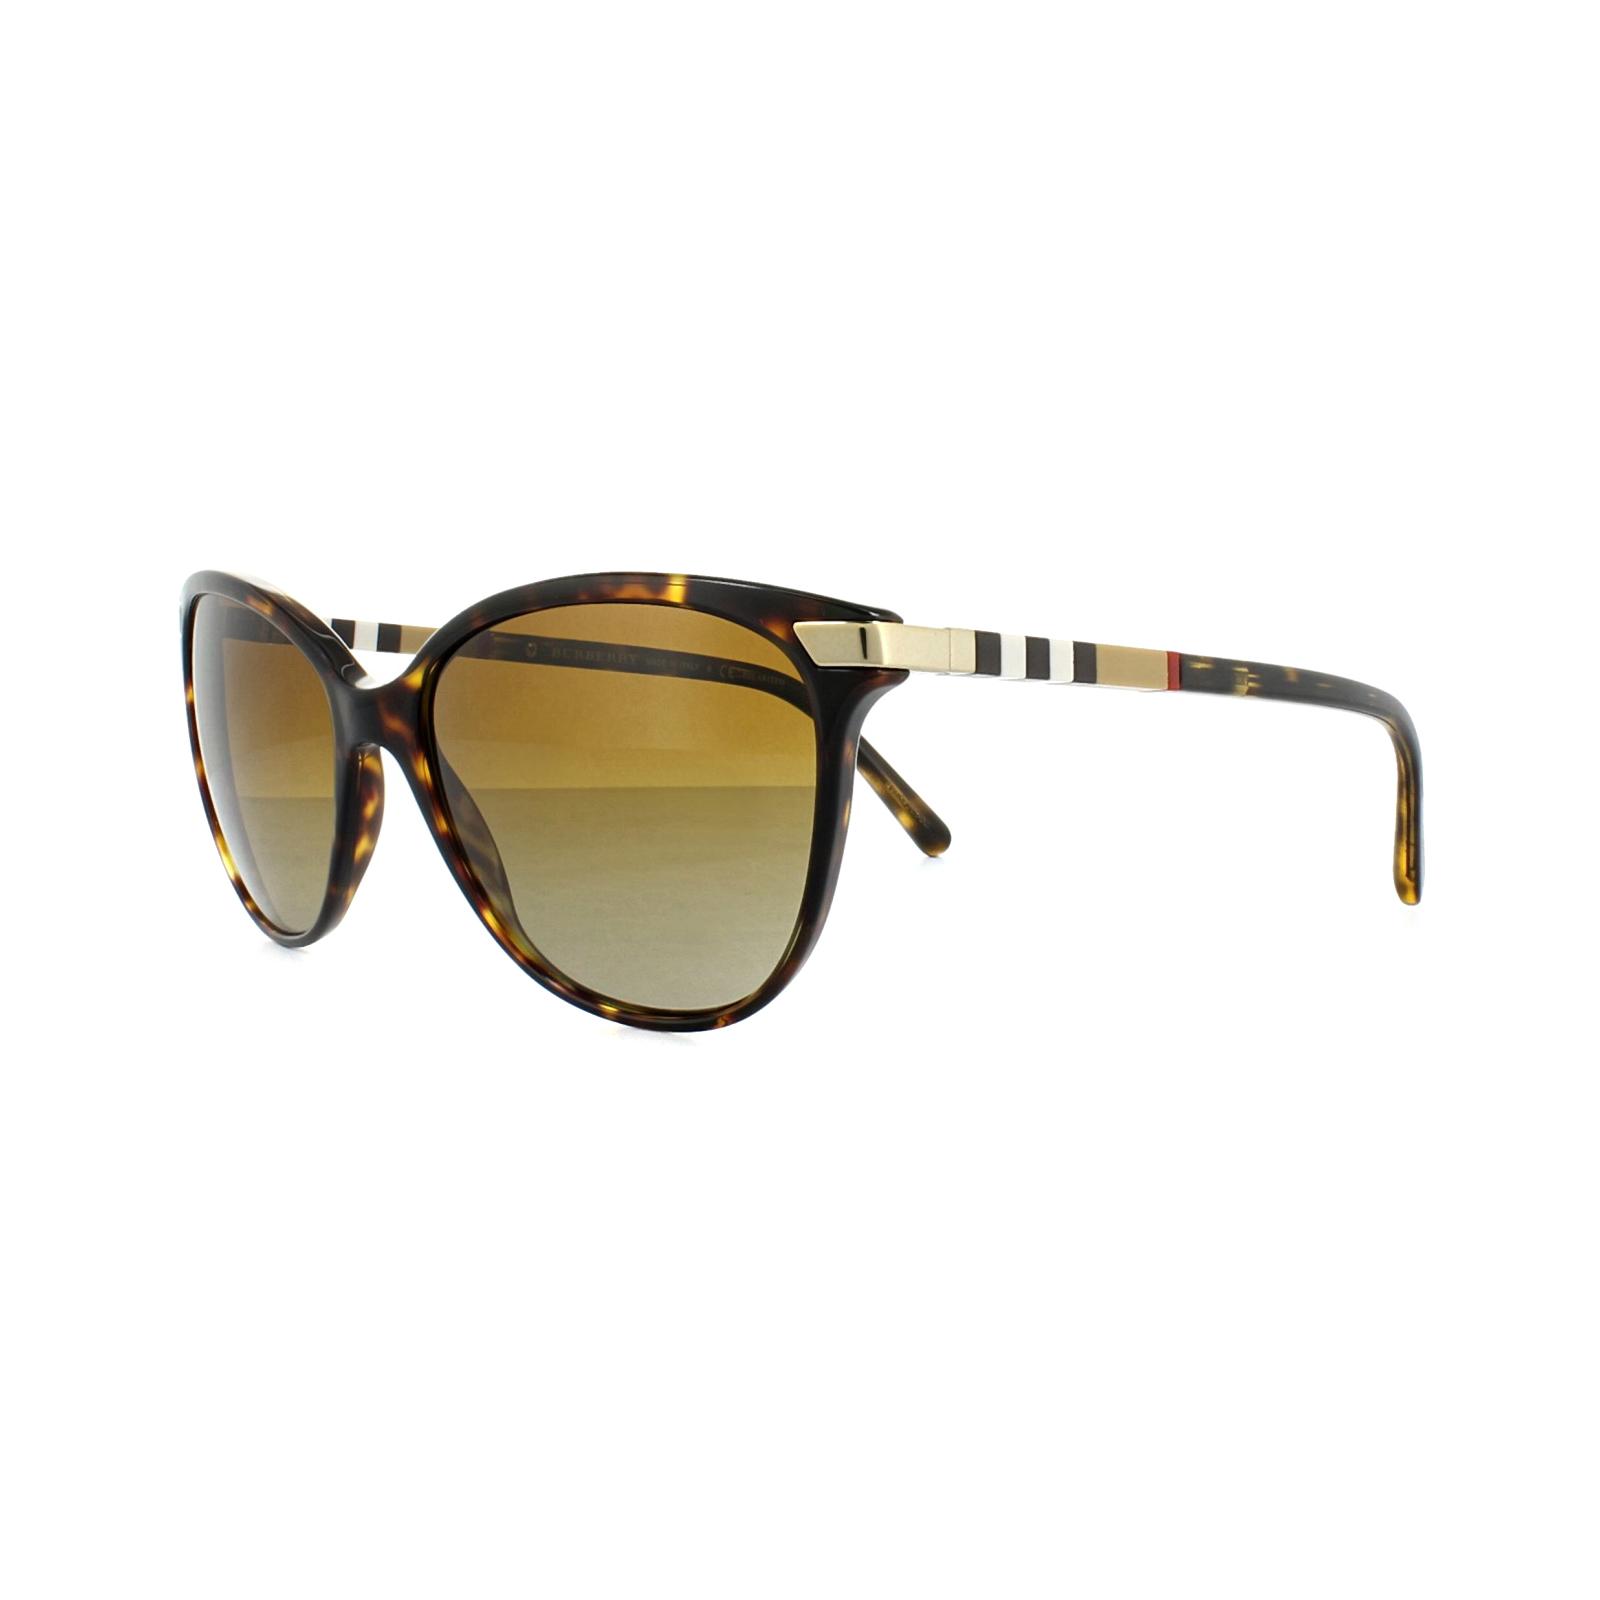 86cf6ca3b806 Cheap Burberry 4216 Sunglasses - Discounted Sunglasses